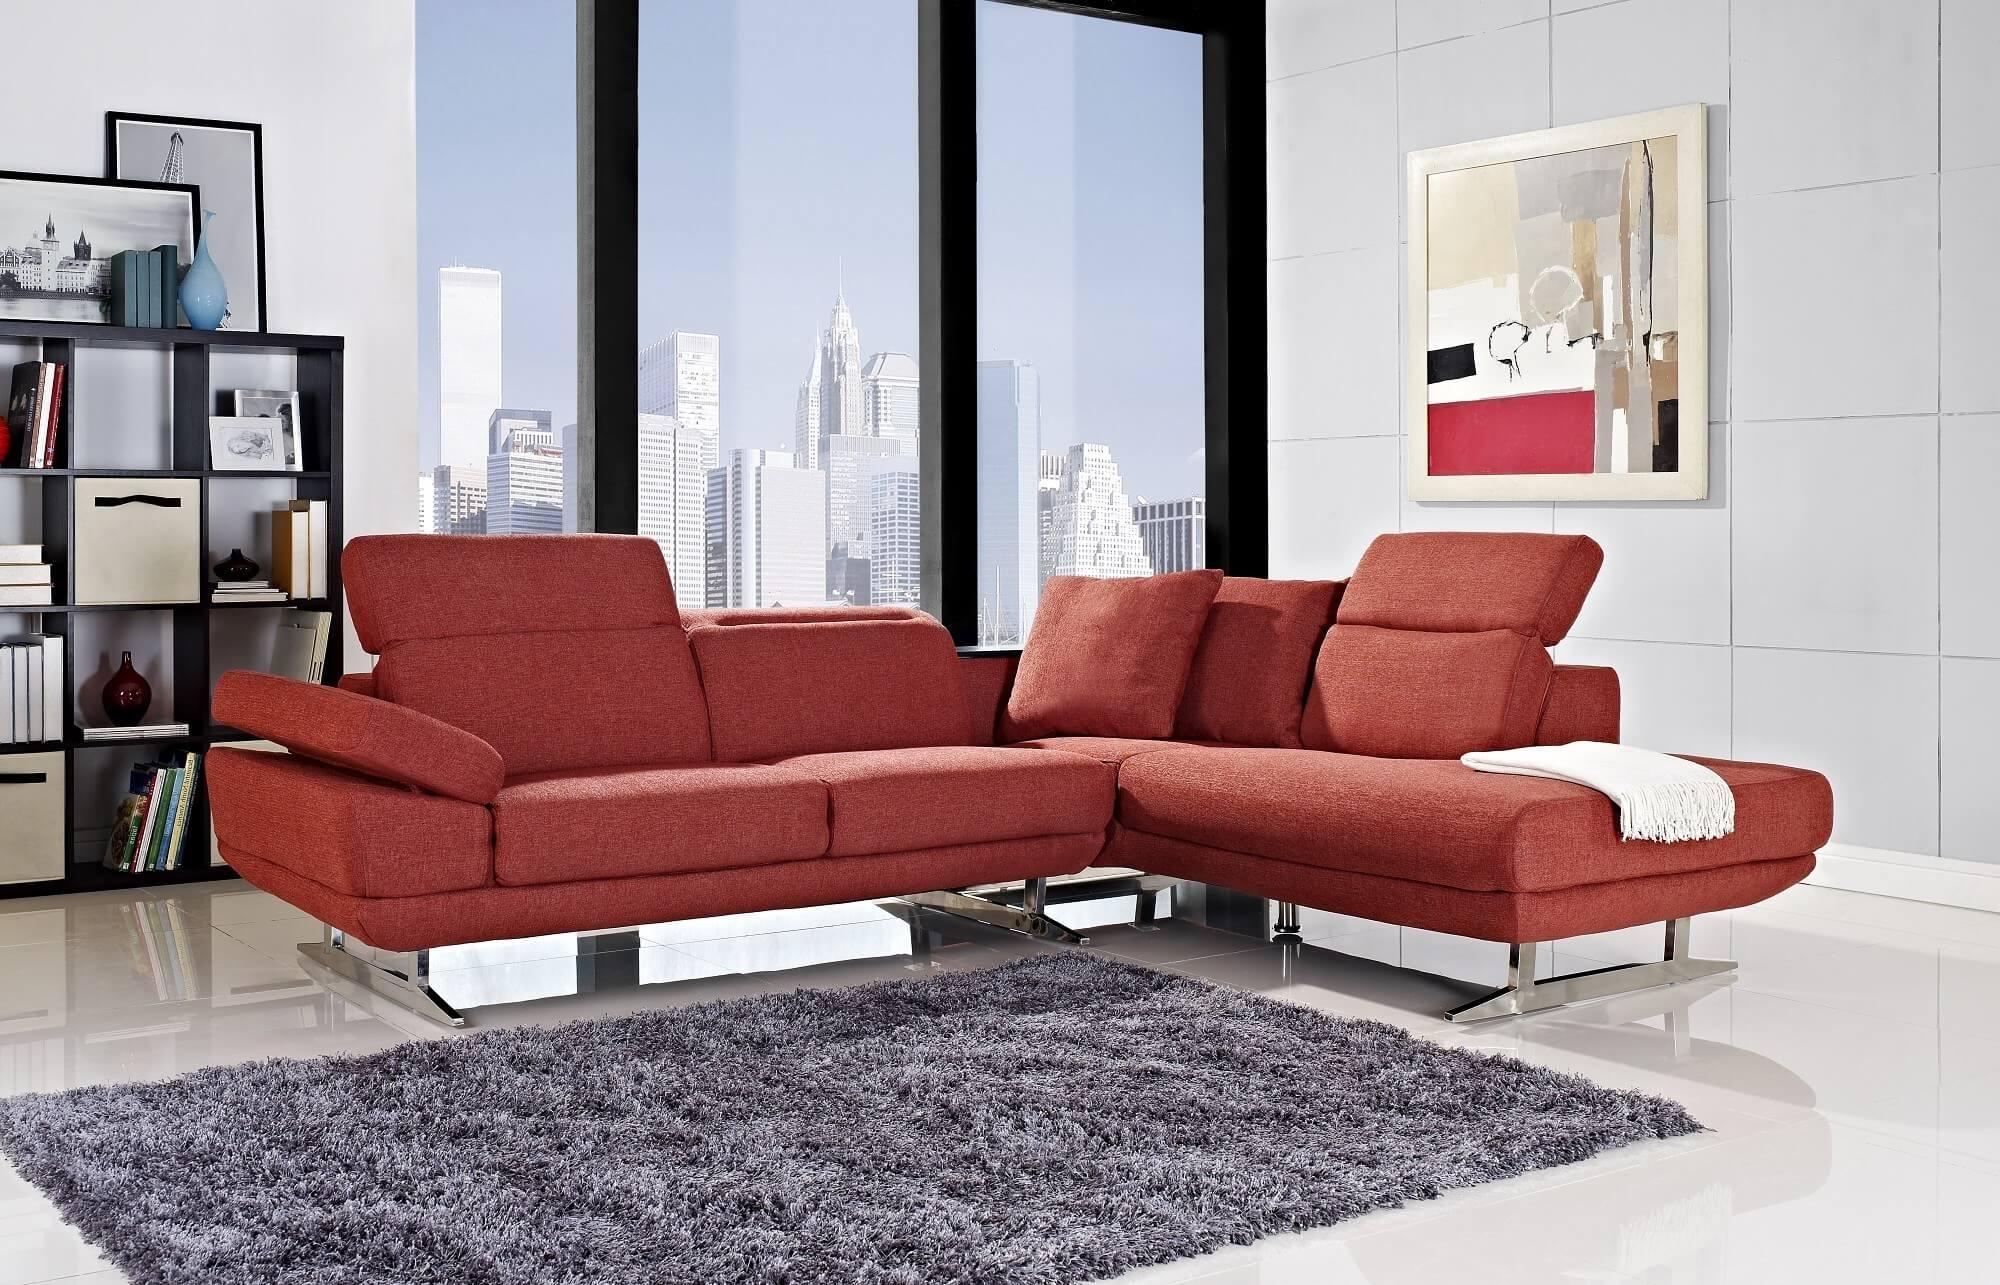 Sectional Sleeper Sofa Chaise